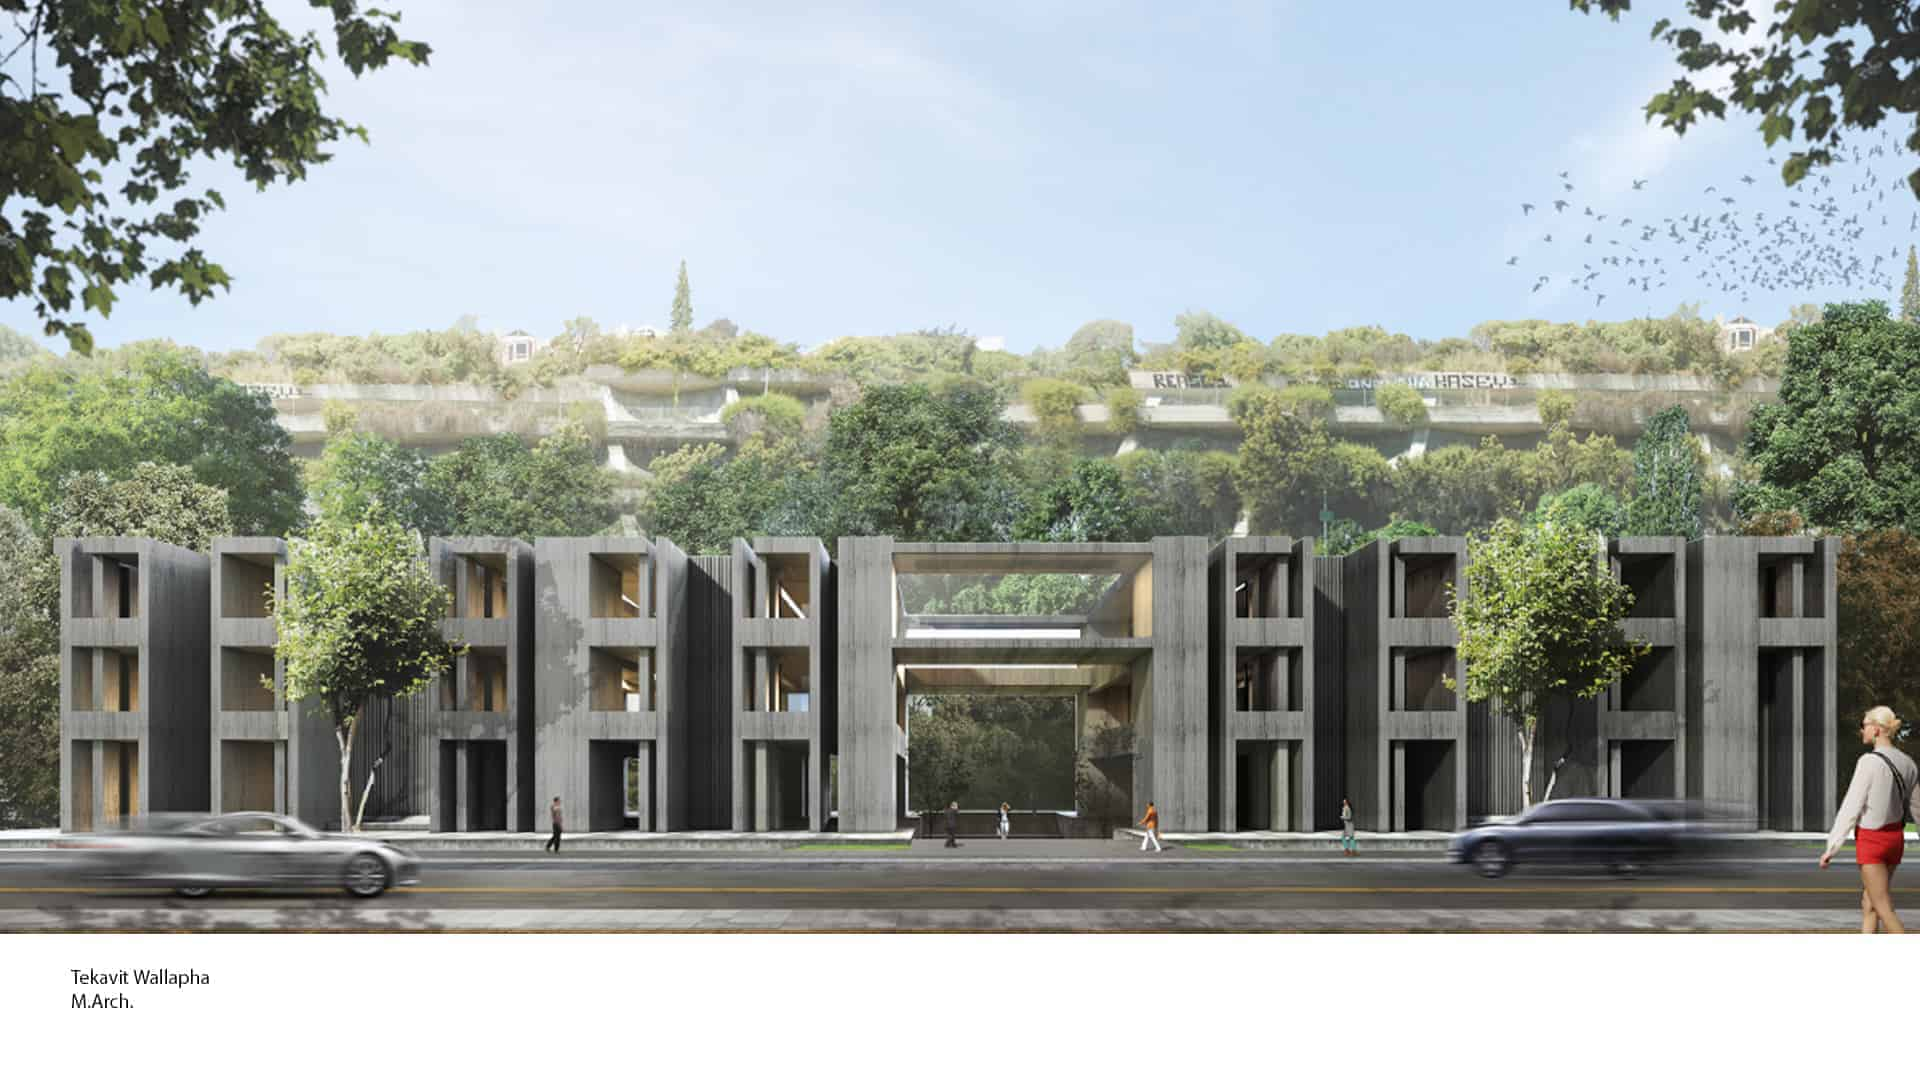 Architecture School Degrees Programs Academy Of Art University